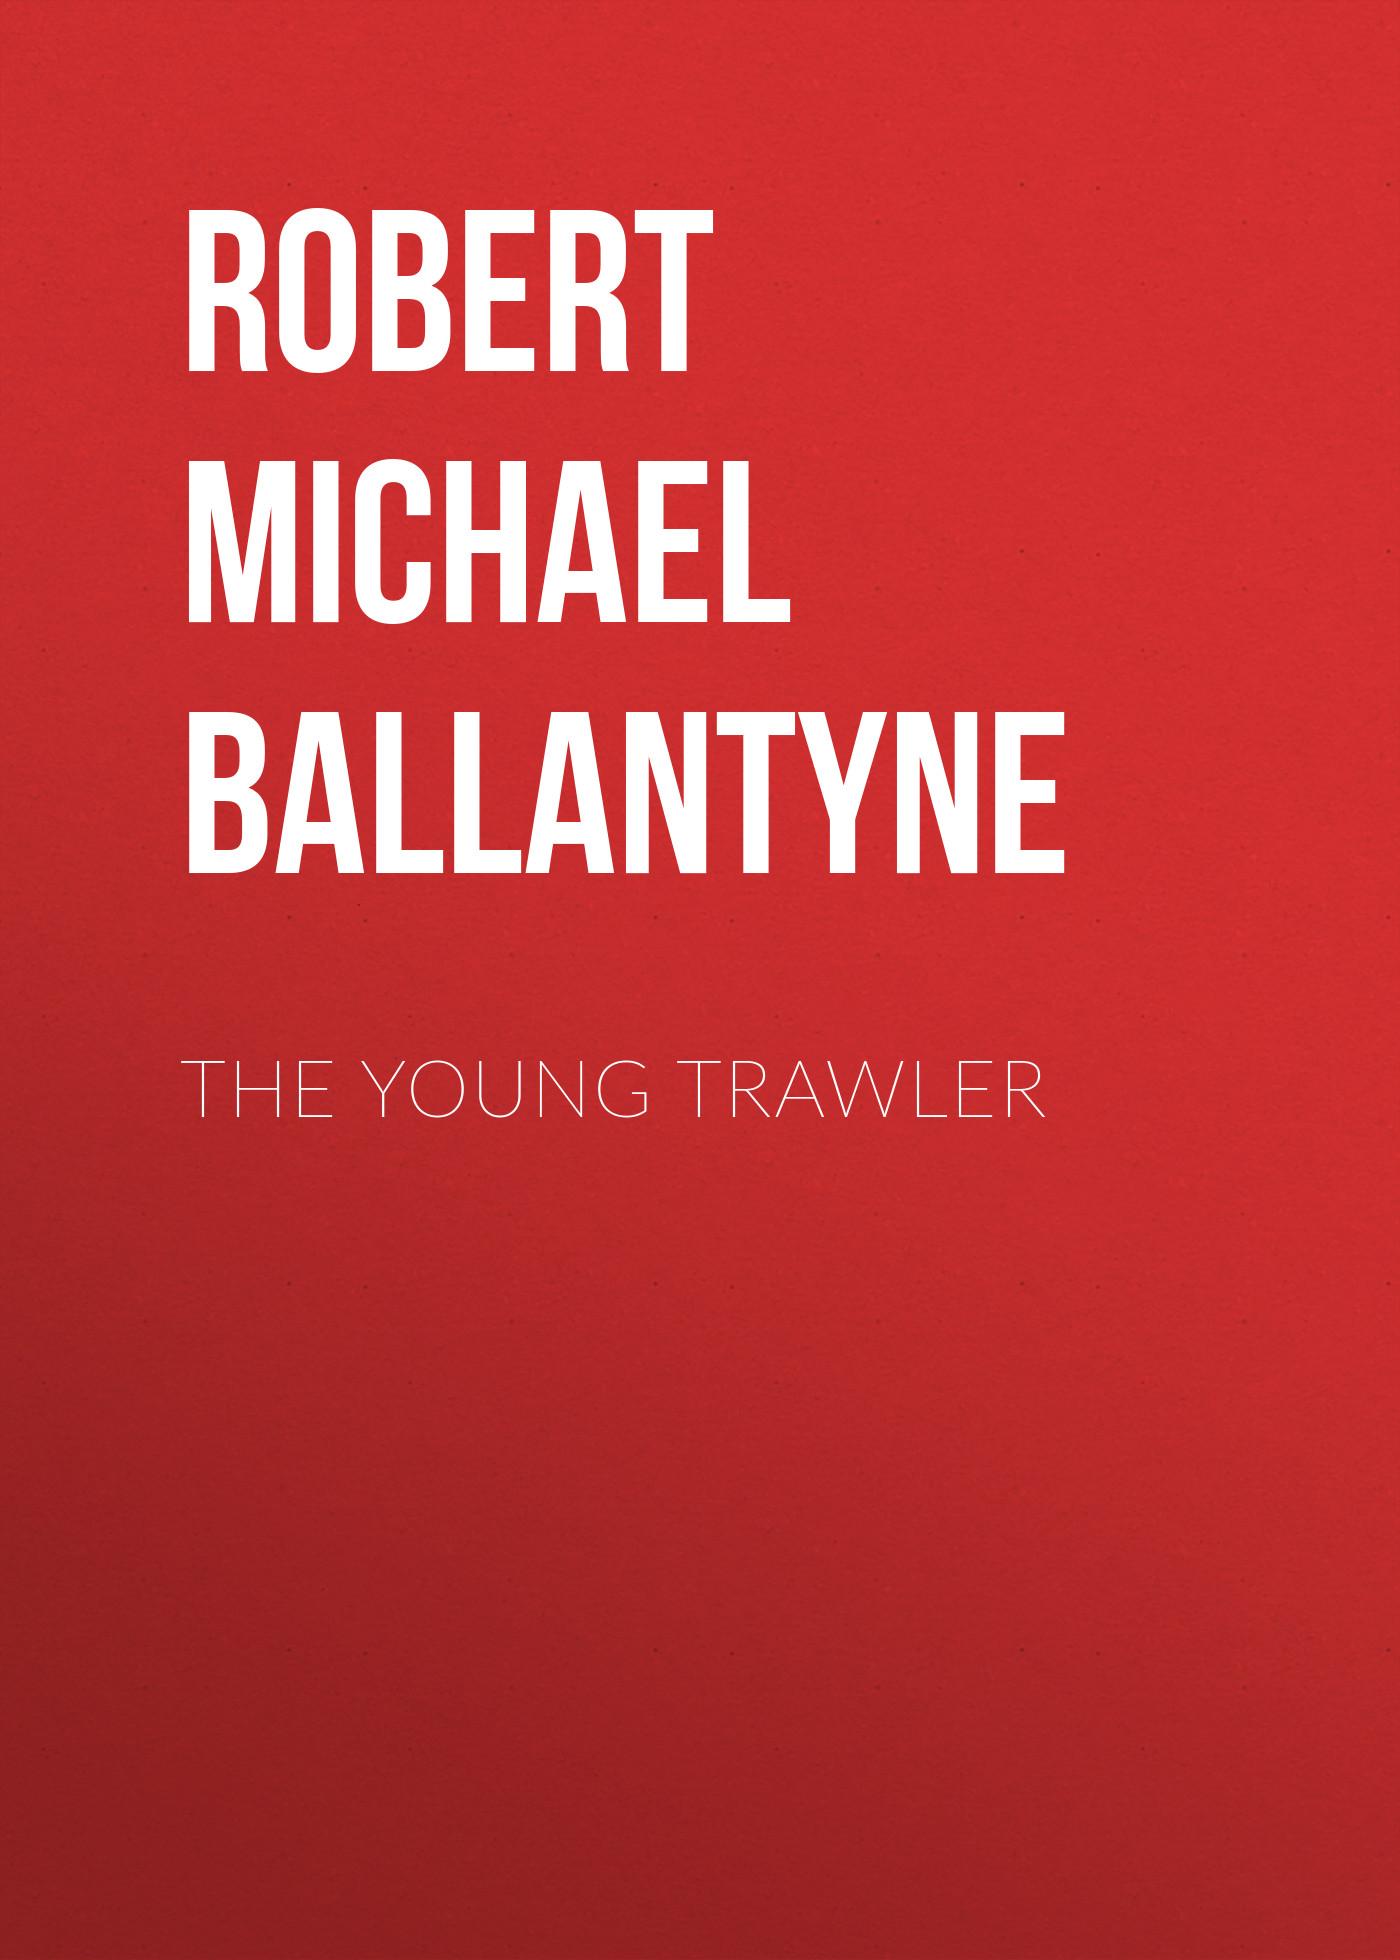 Robert Michael Ballantyne The Young Trawler robert michael ballantyne the thorogood family